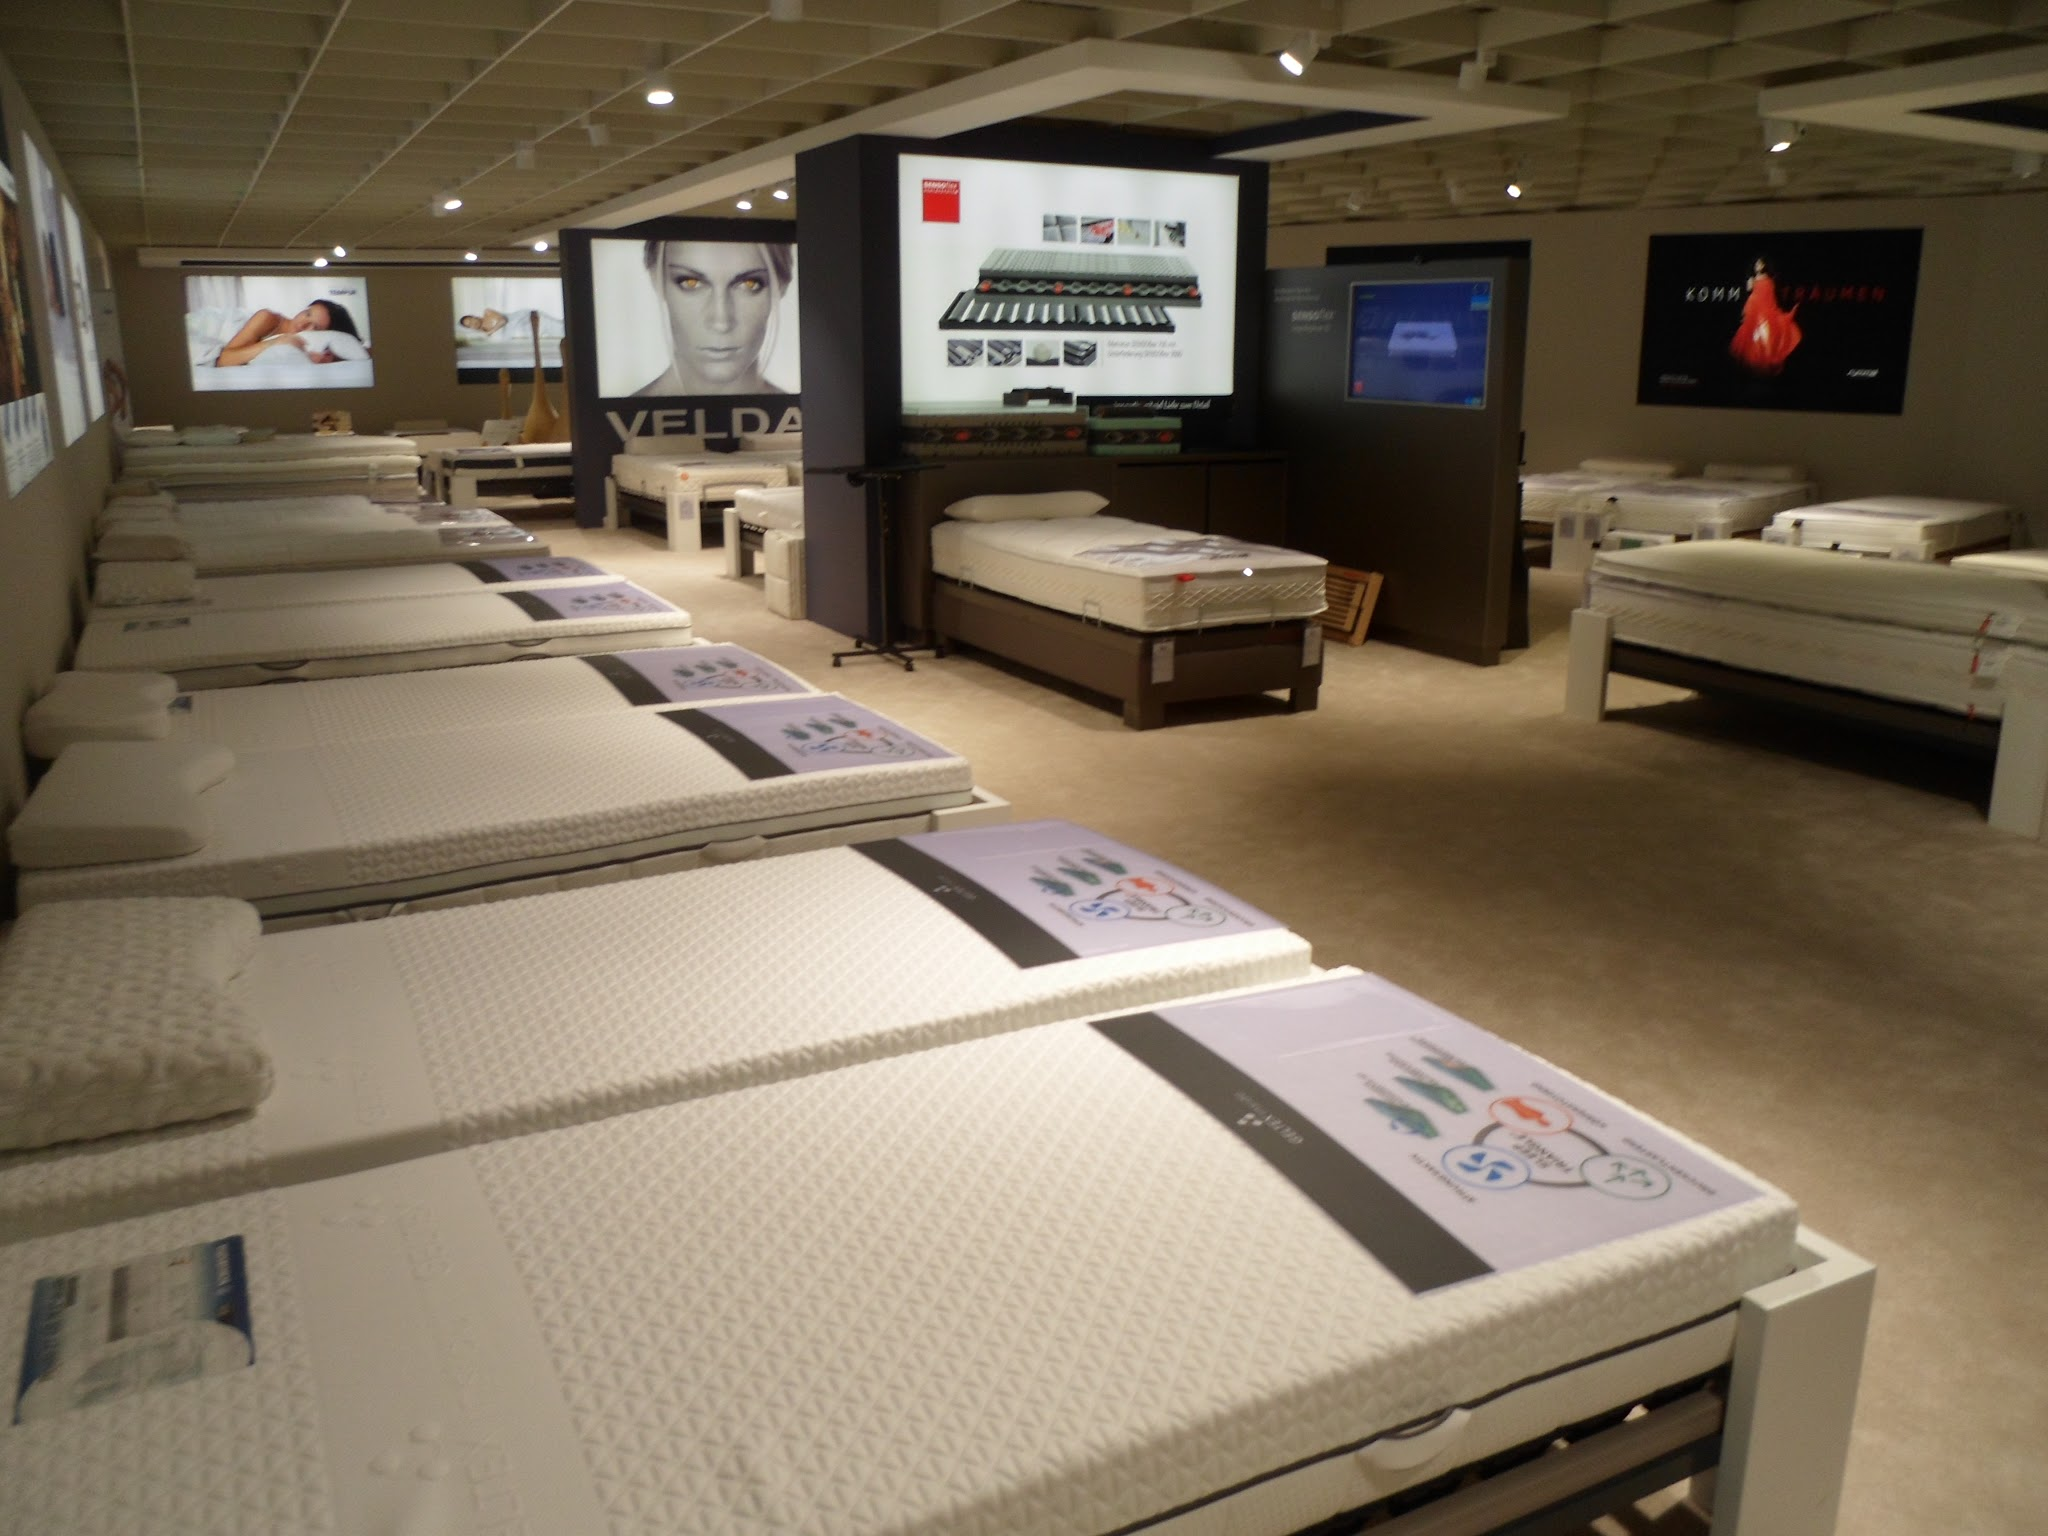 haus garten in herxheim bei landau pfalz infobel. Black Bedroom Furniture Sets. Home Design Ideas